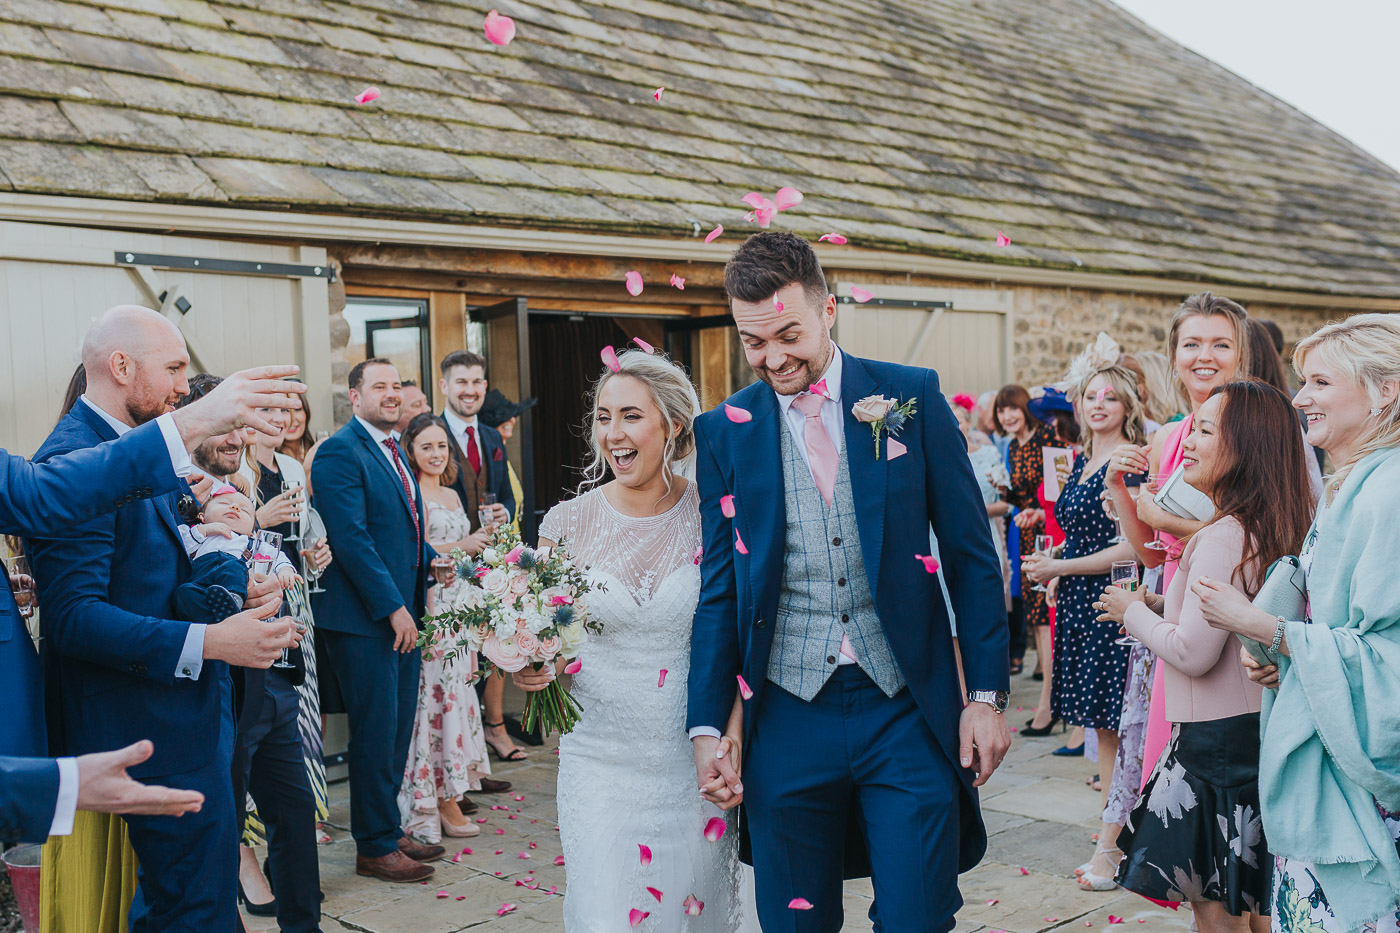 Tithe Barn - Laura Calderwood Photography - 29.3.19 - Mr & Mrs Lancaster290319-92.jpg